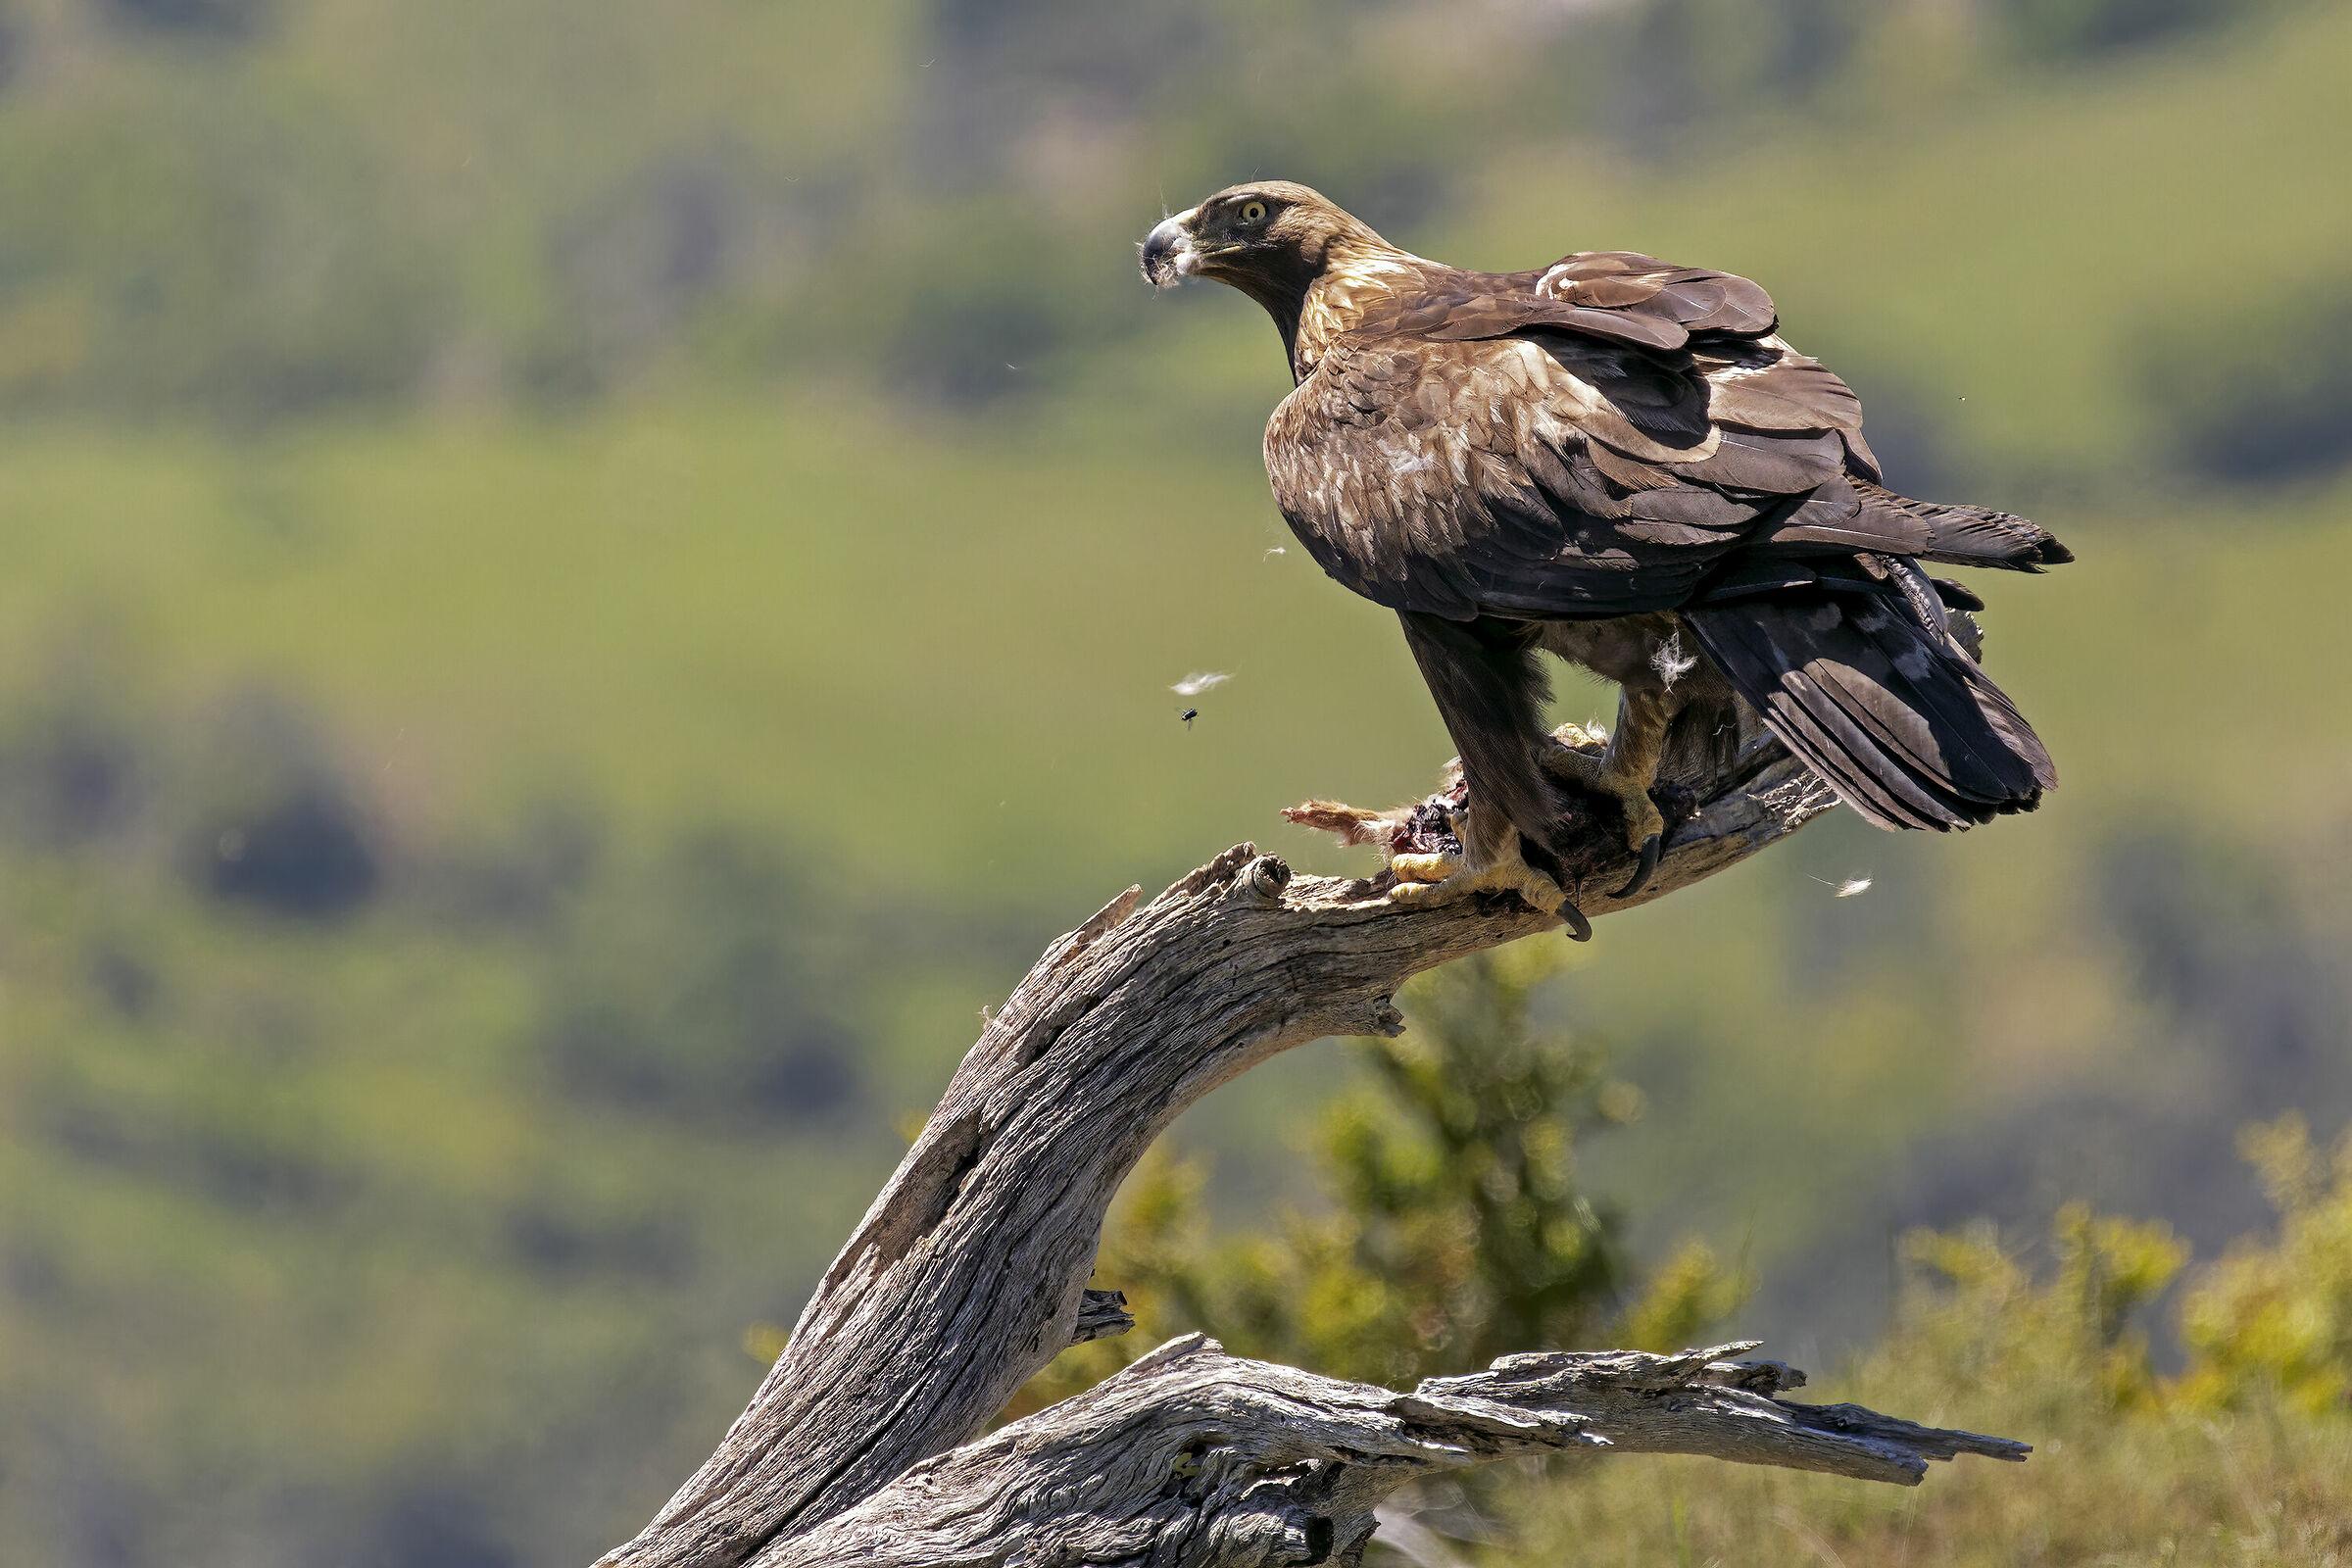 Aquila reale...